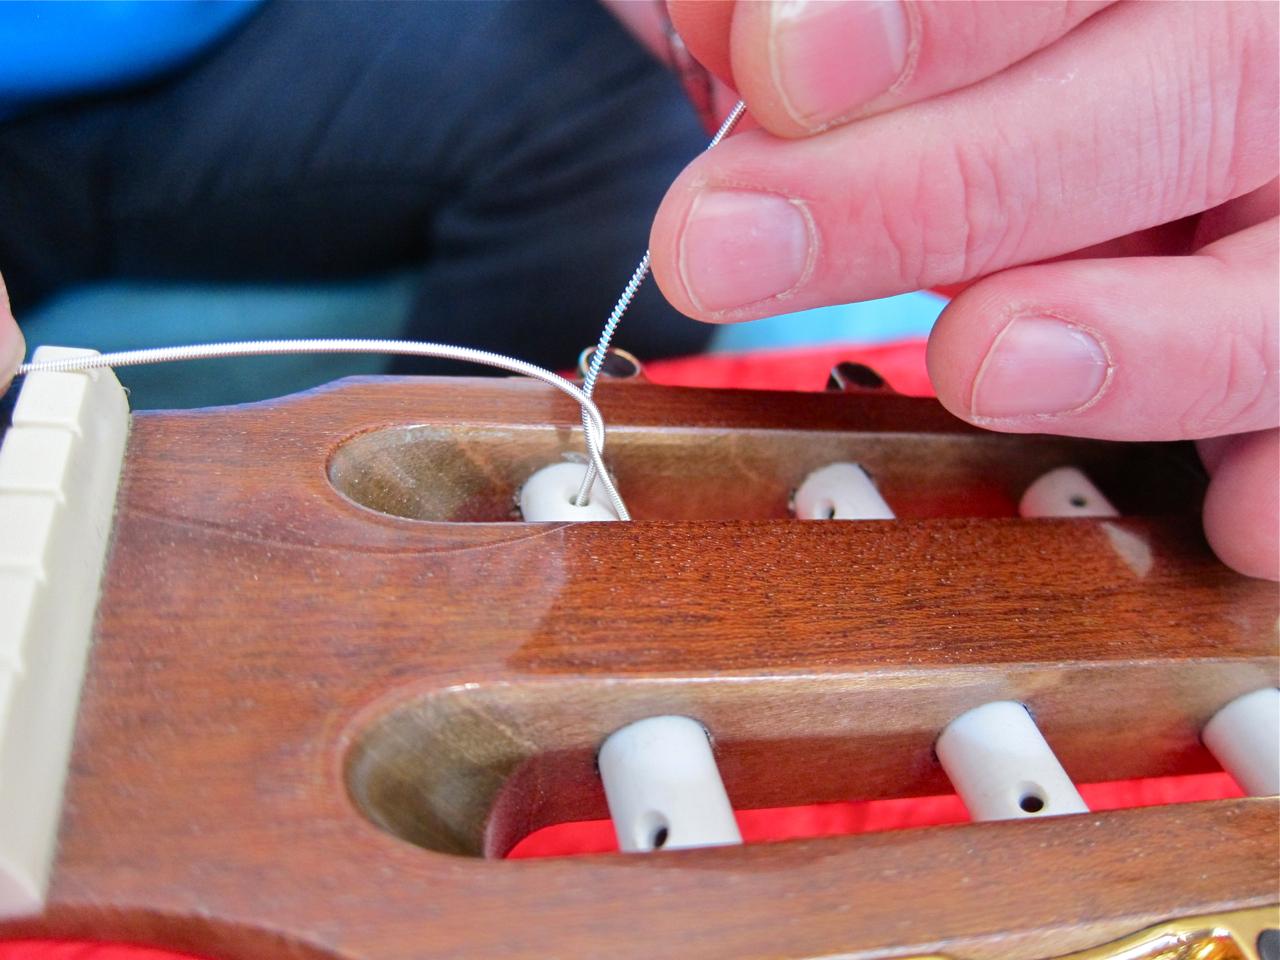 gitarrensaiten wechseln wie oft